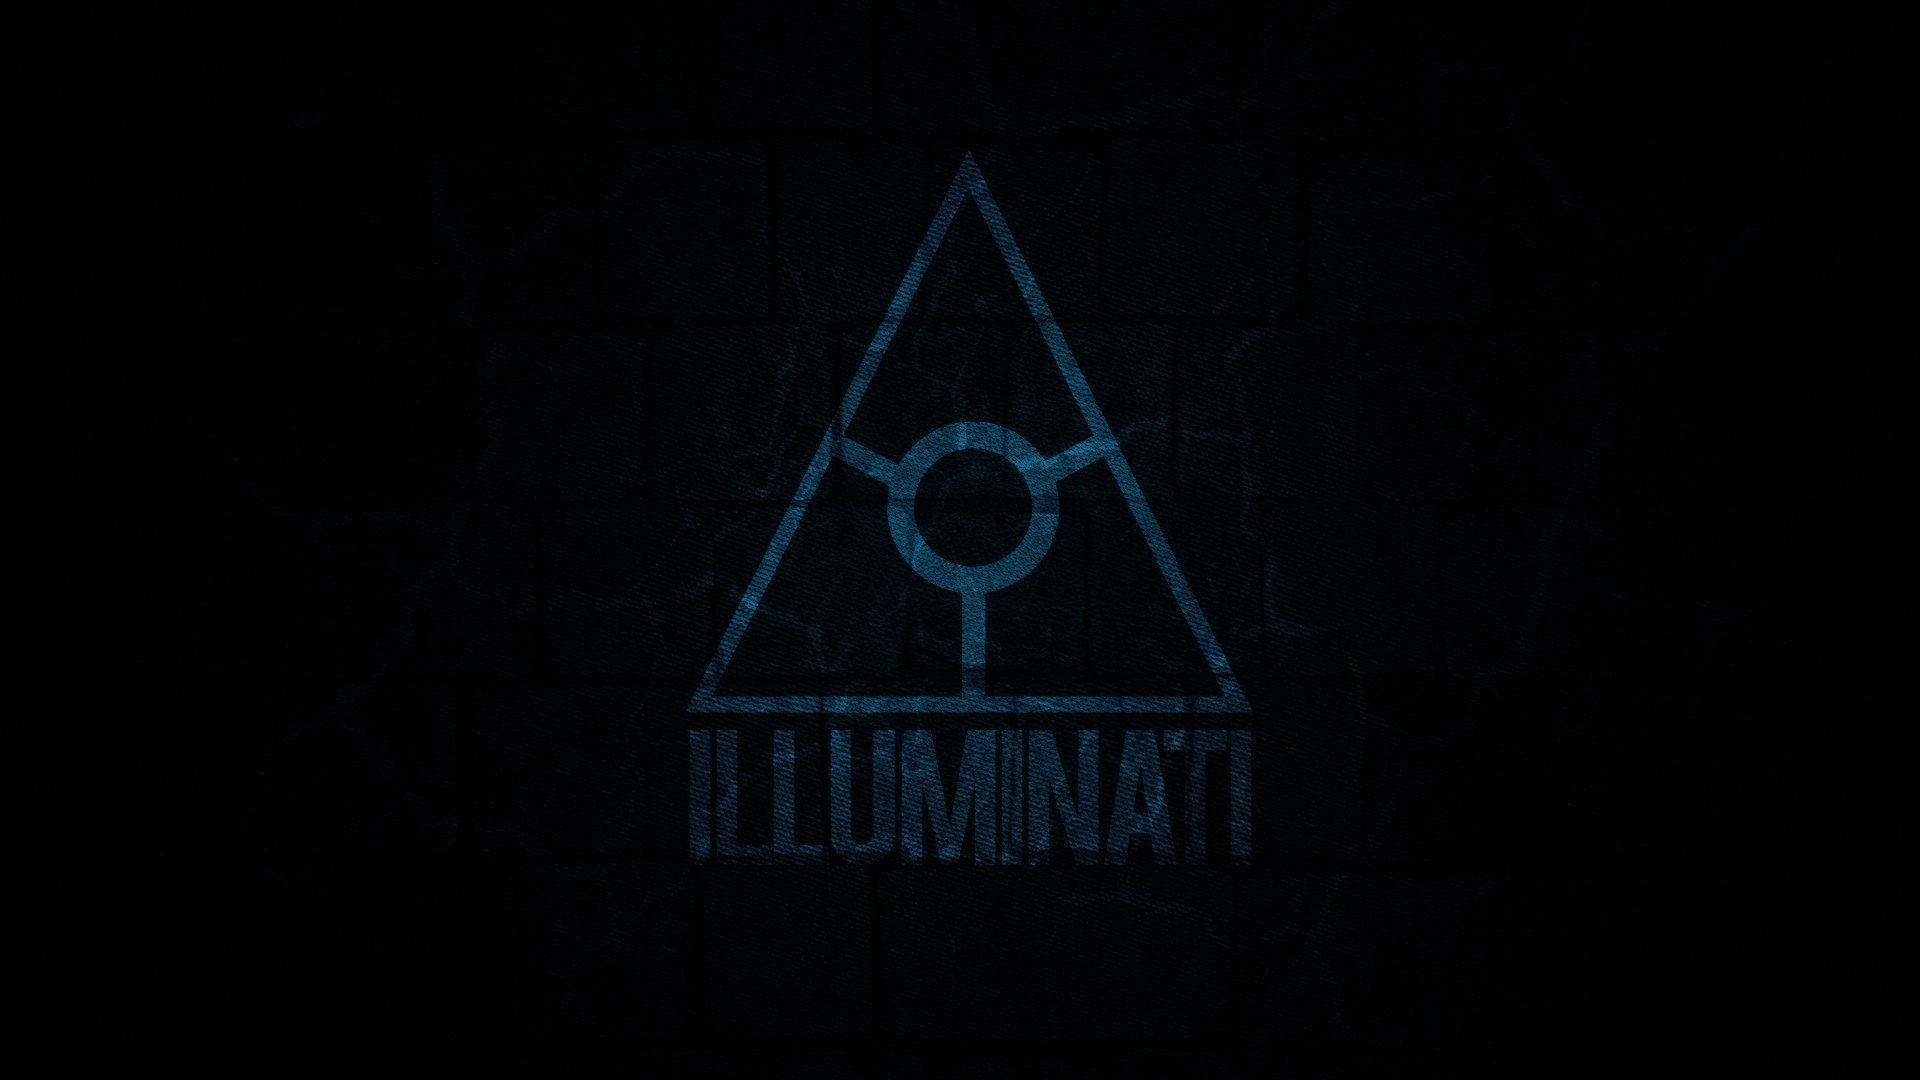 Best Michael Jordan Illuminati Wallpaper HD Wallpapers of Nature- Full HD 1080p  Desktop Backgrounds for